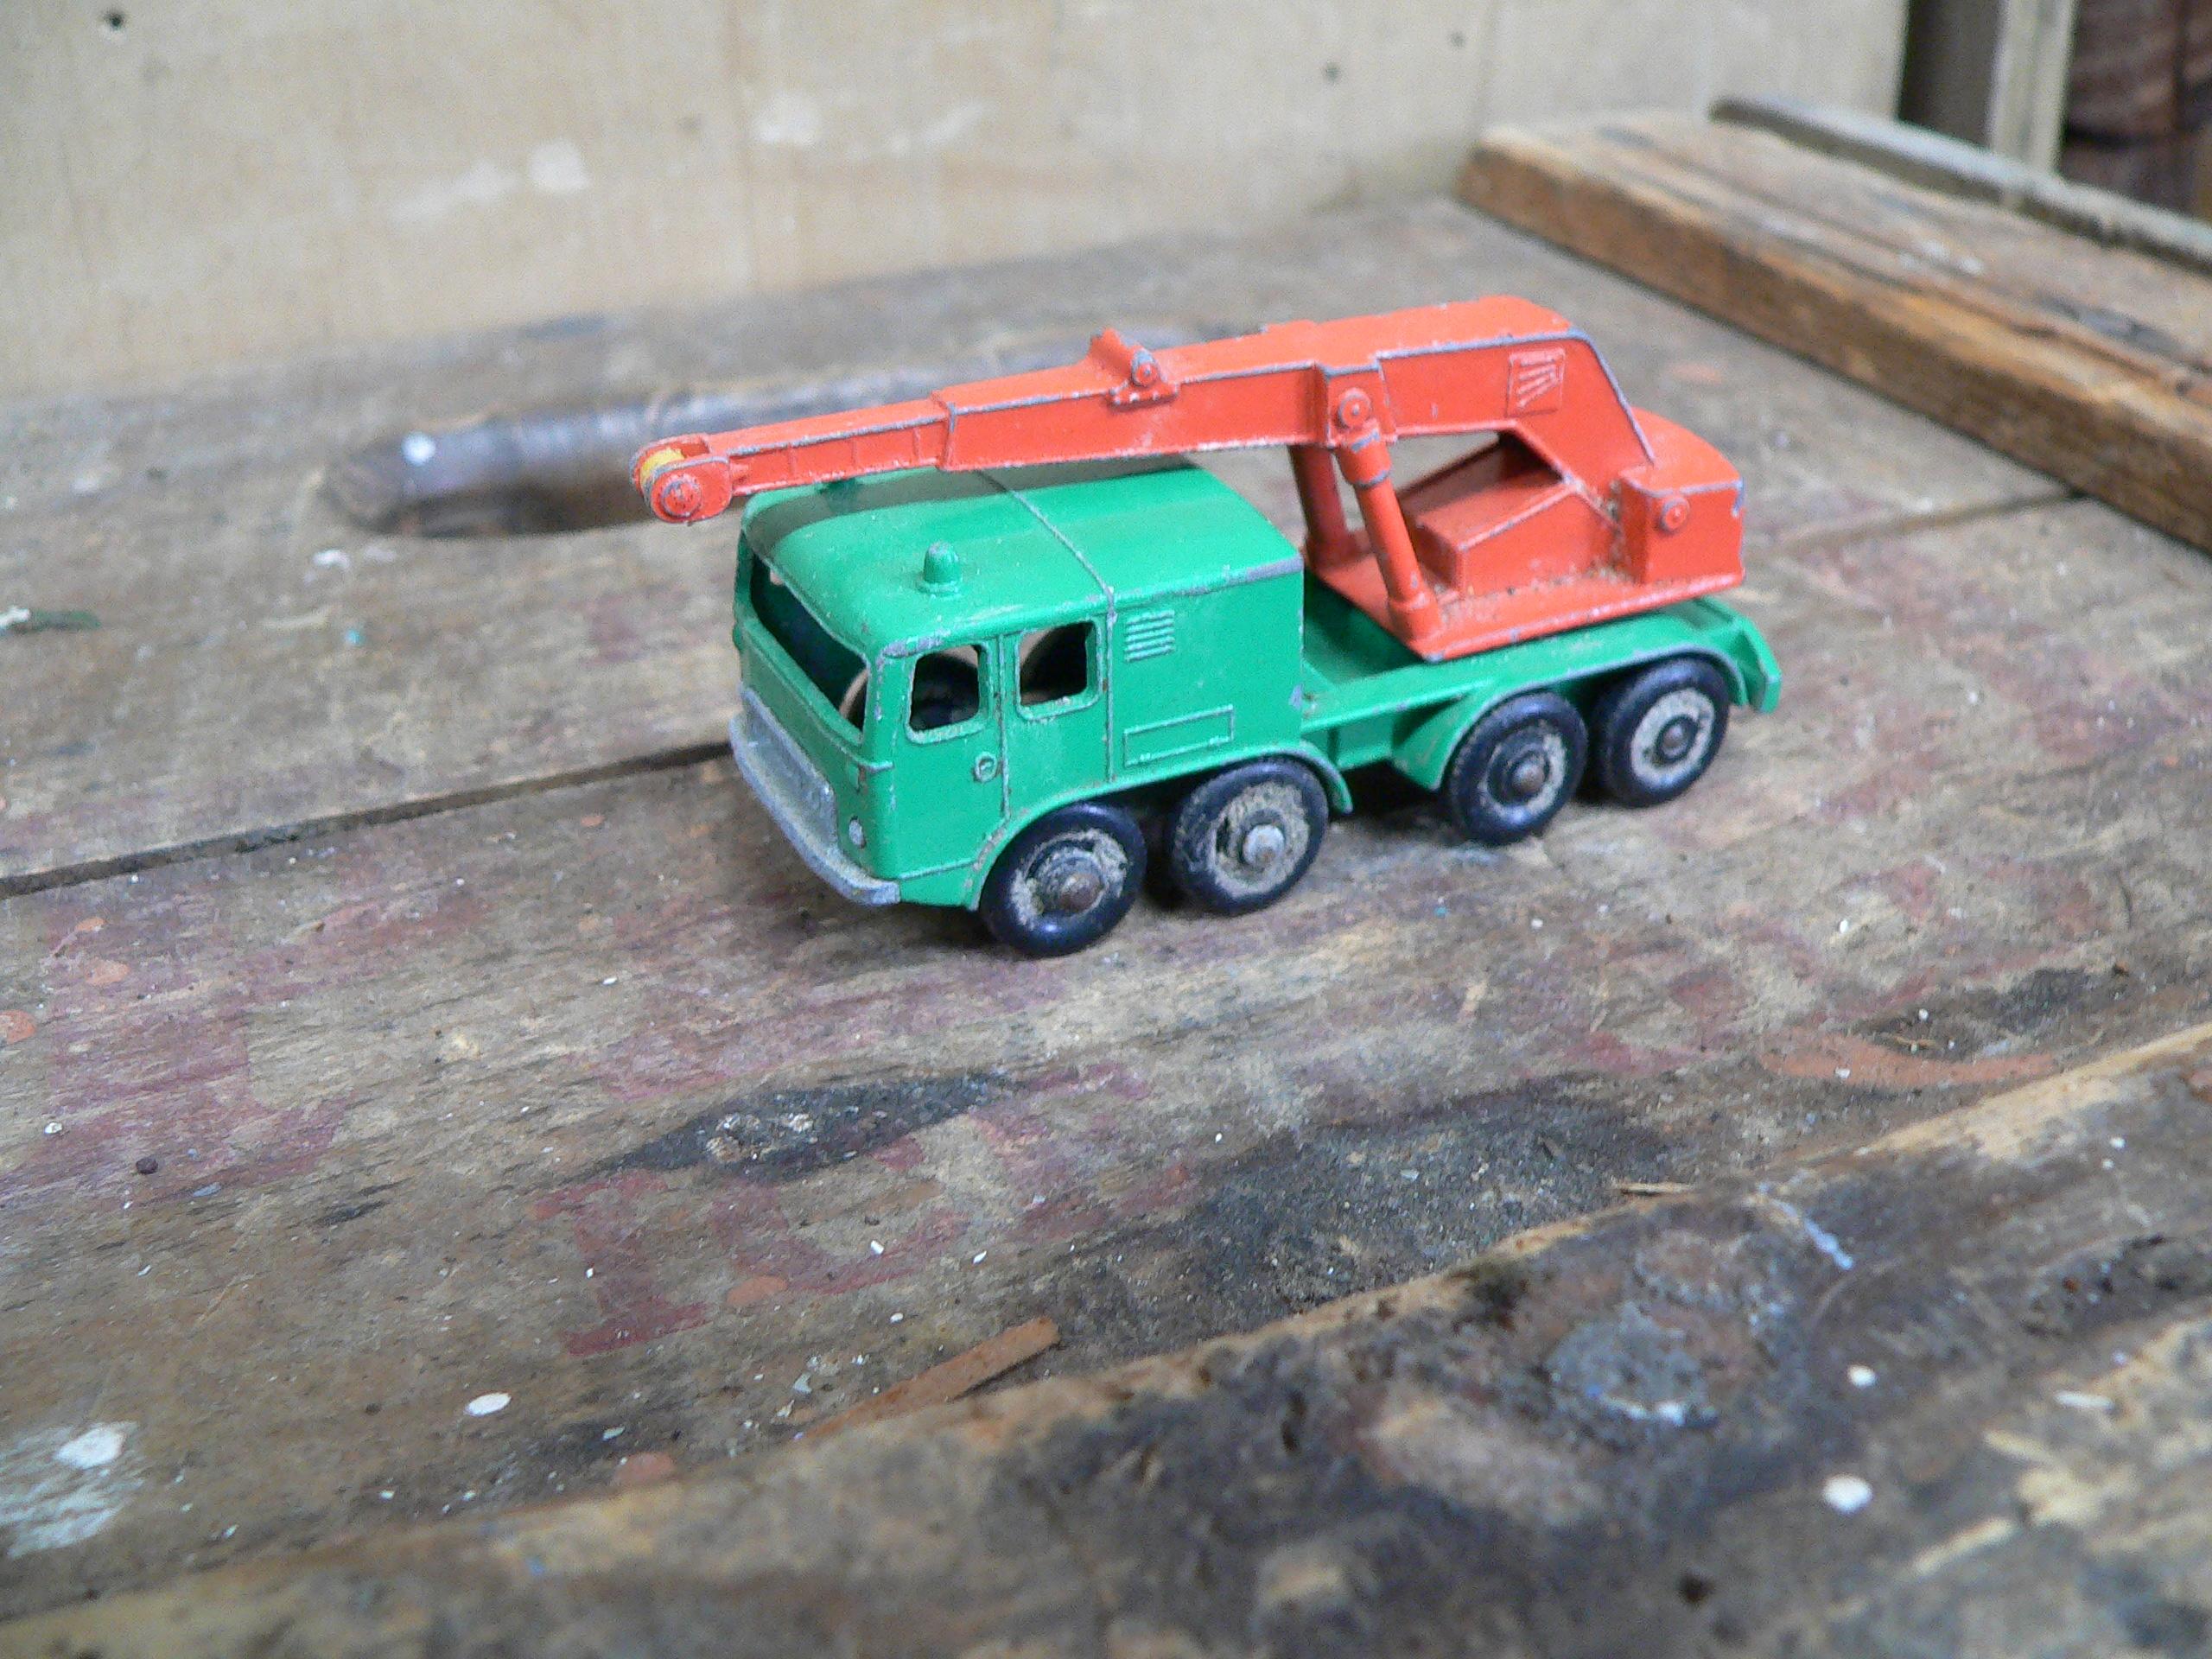 8 wheel crane truck # 5928.4